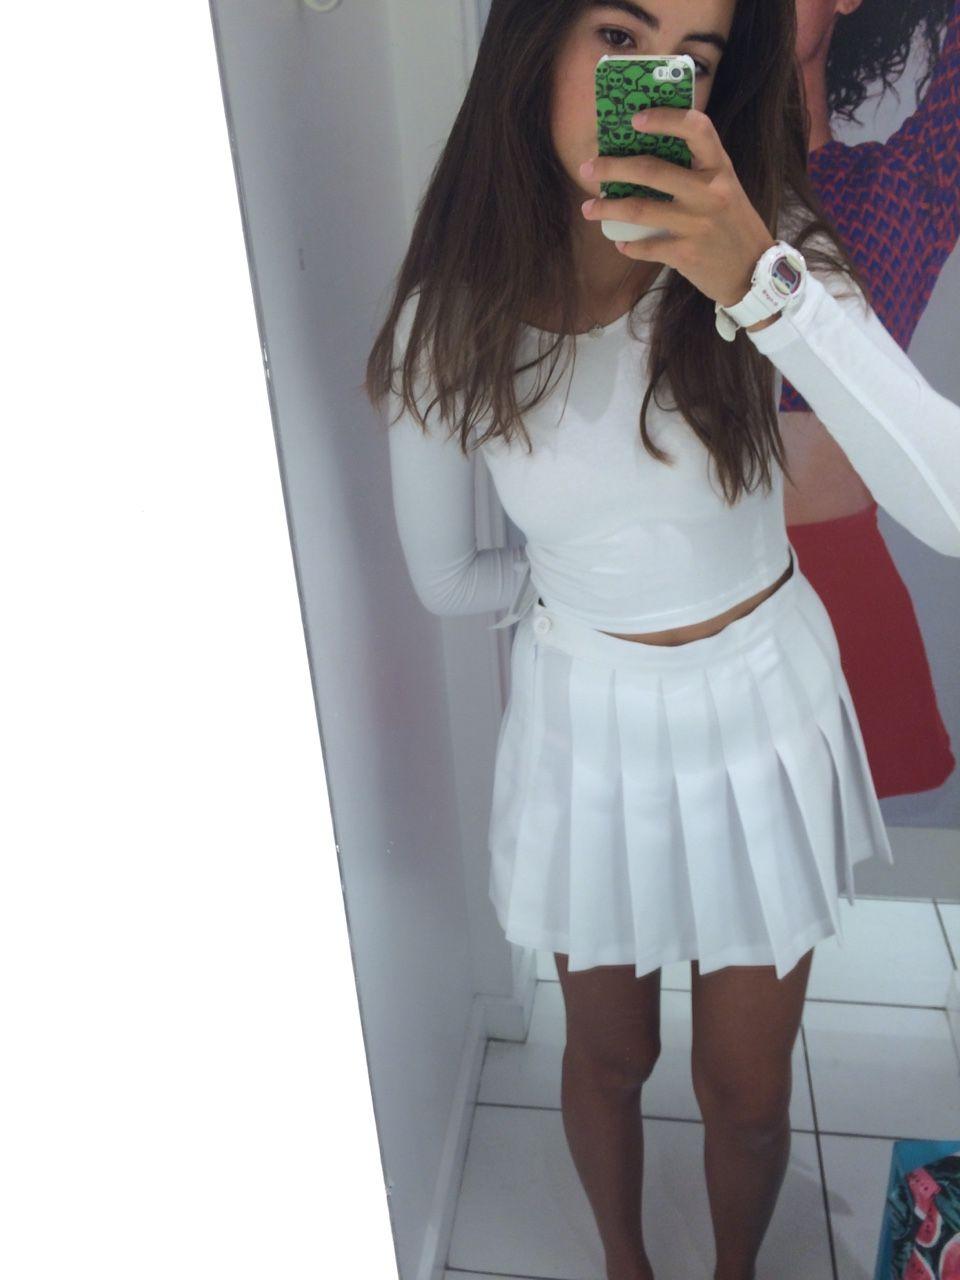 Tennis Skirt On Tumblr Skirts Skirt Tumblr Pleated Tennis Skirt